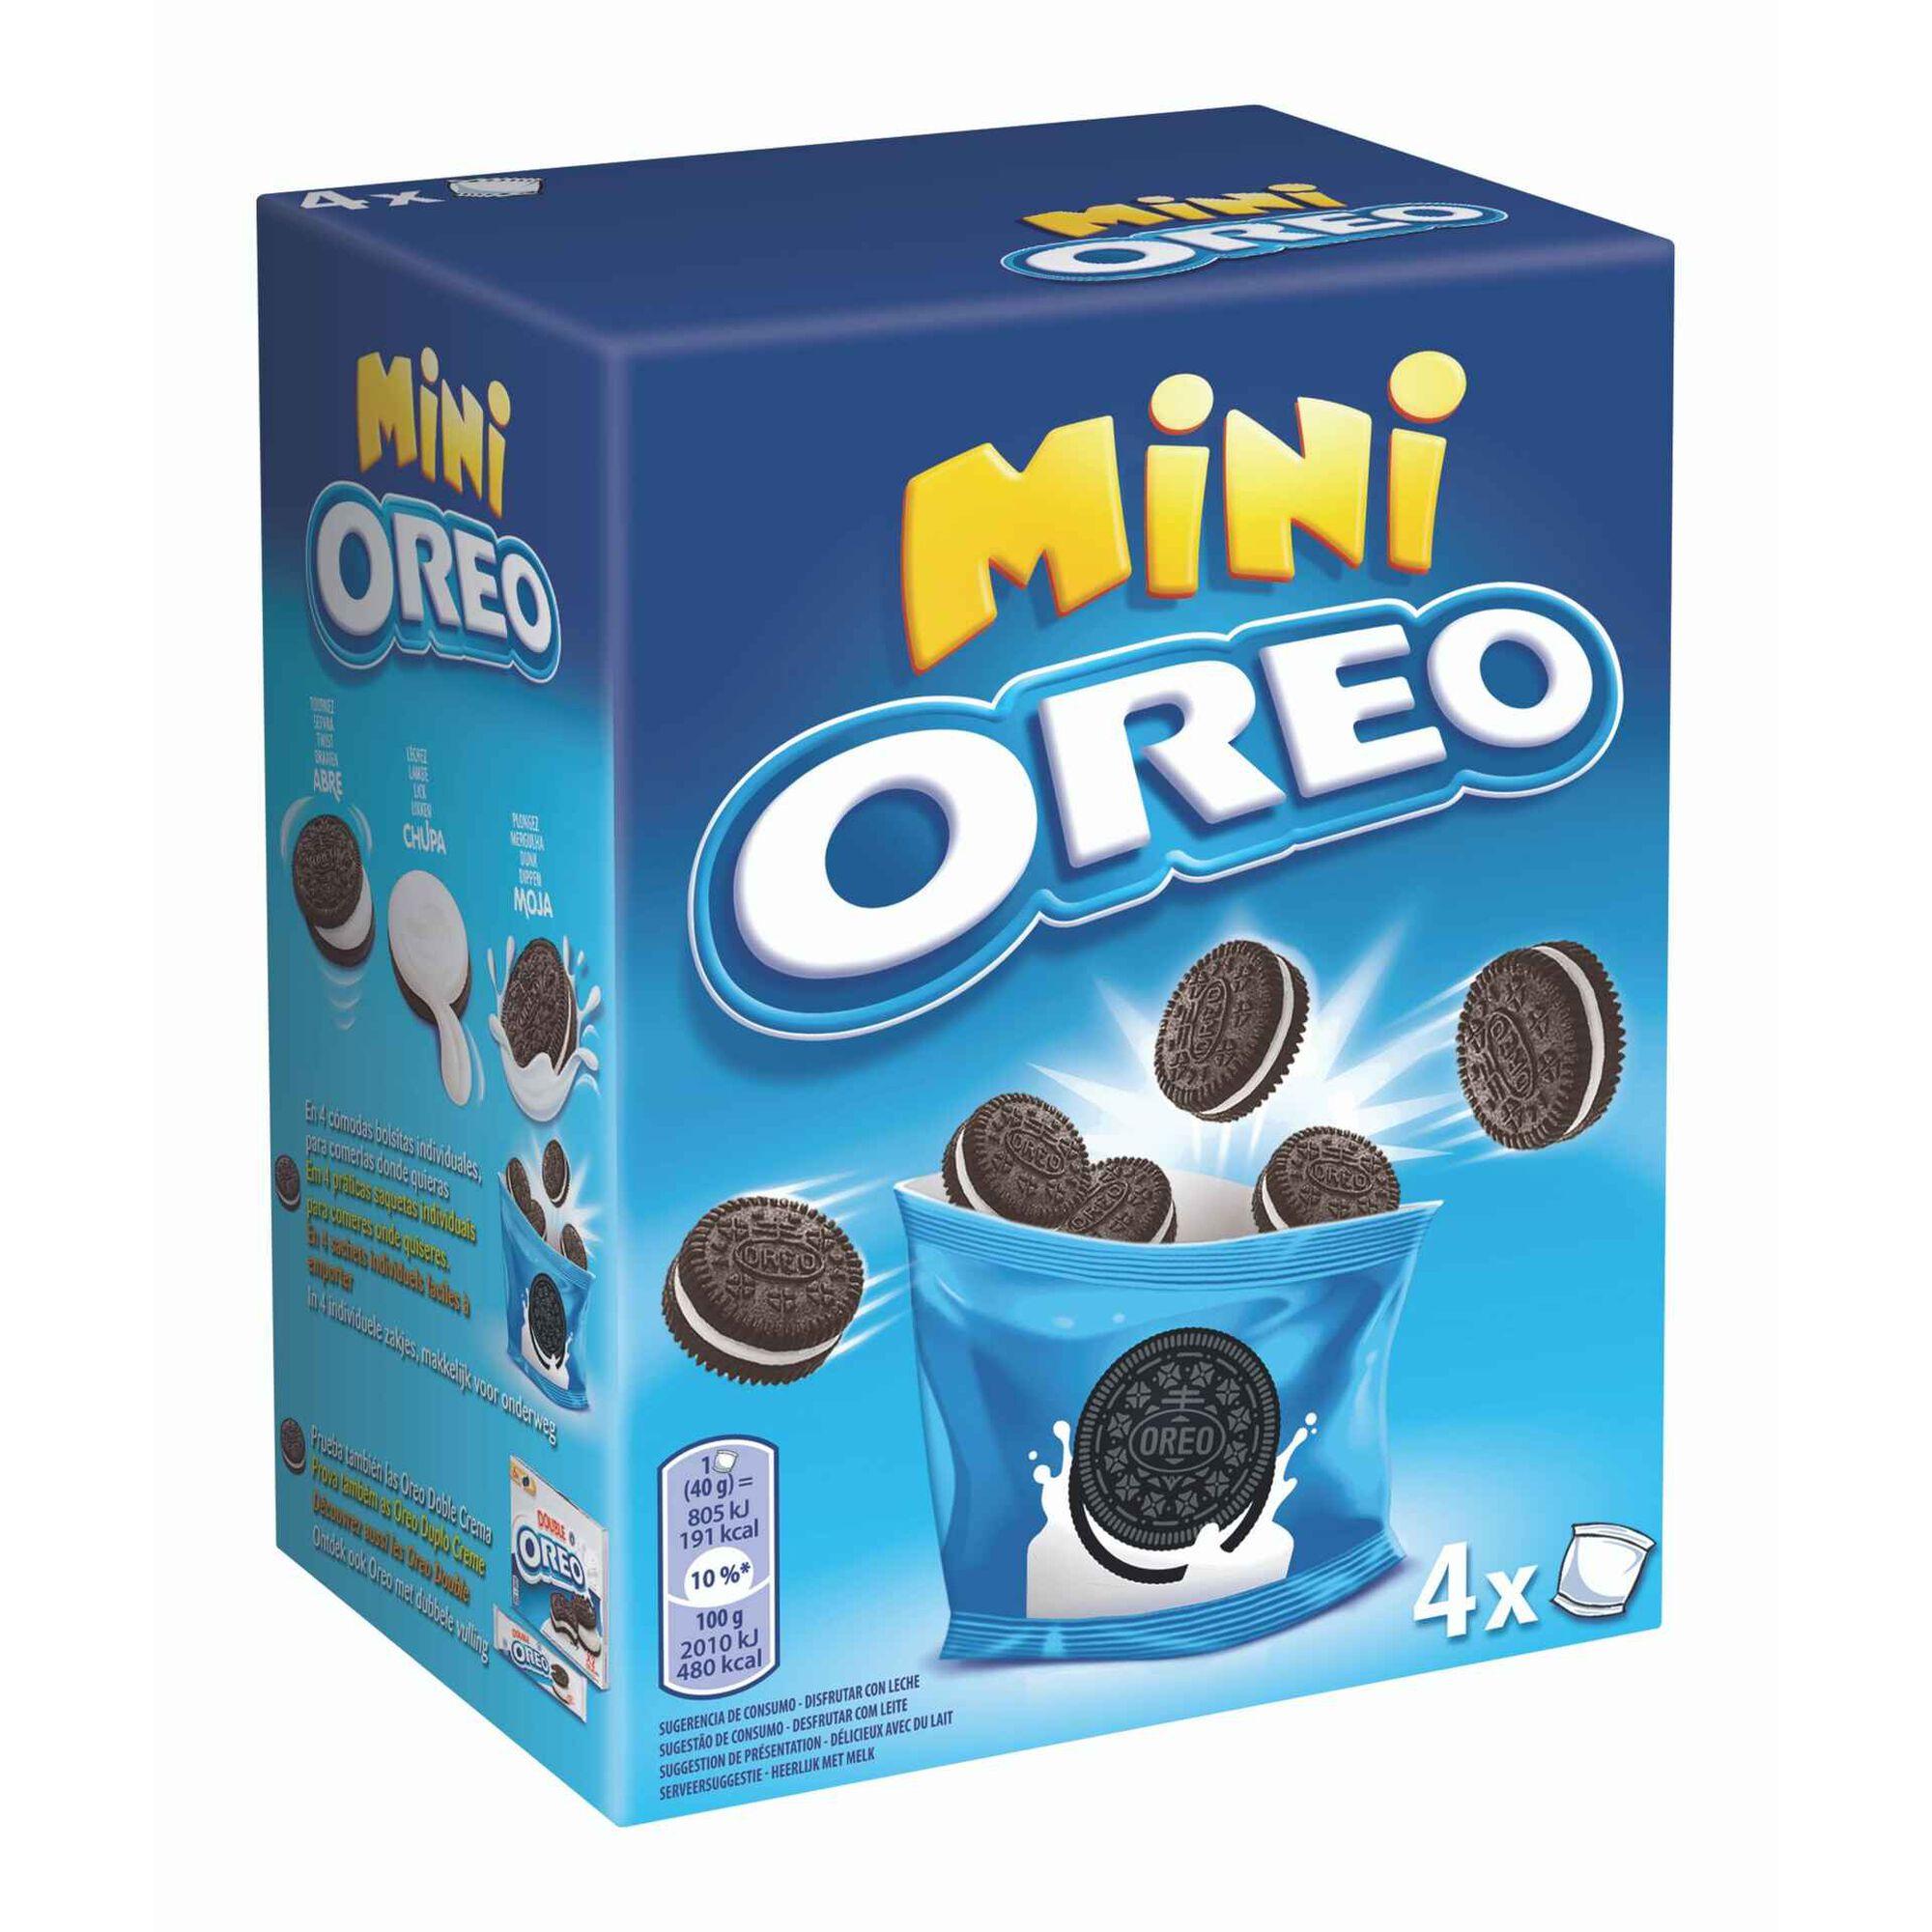 Bolachas Mini Recheadas com Chocolate